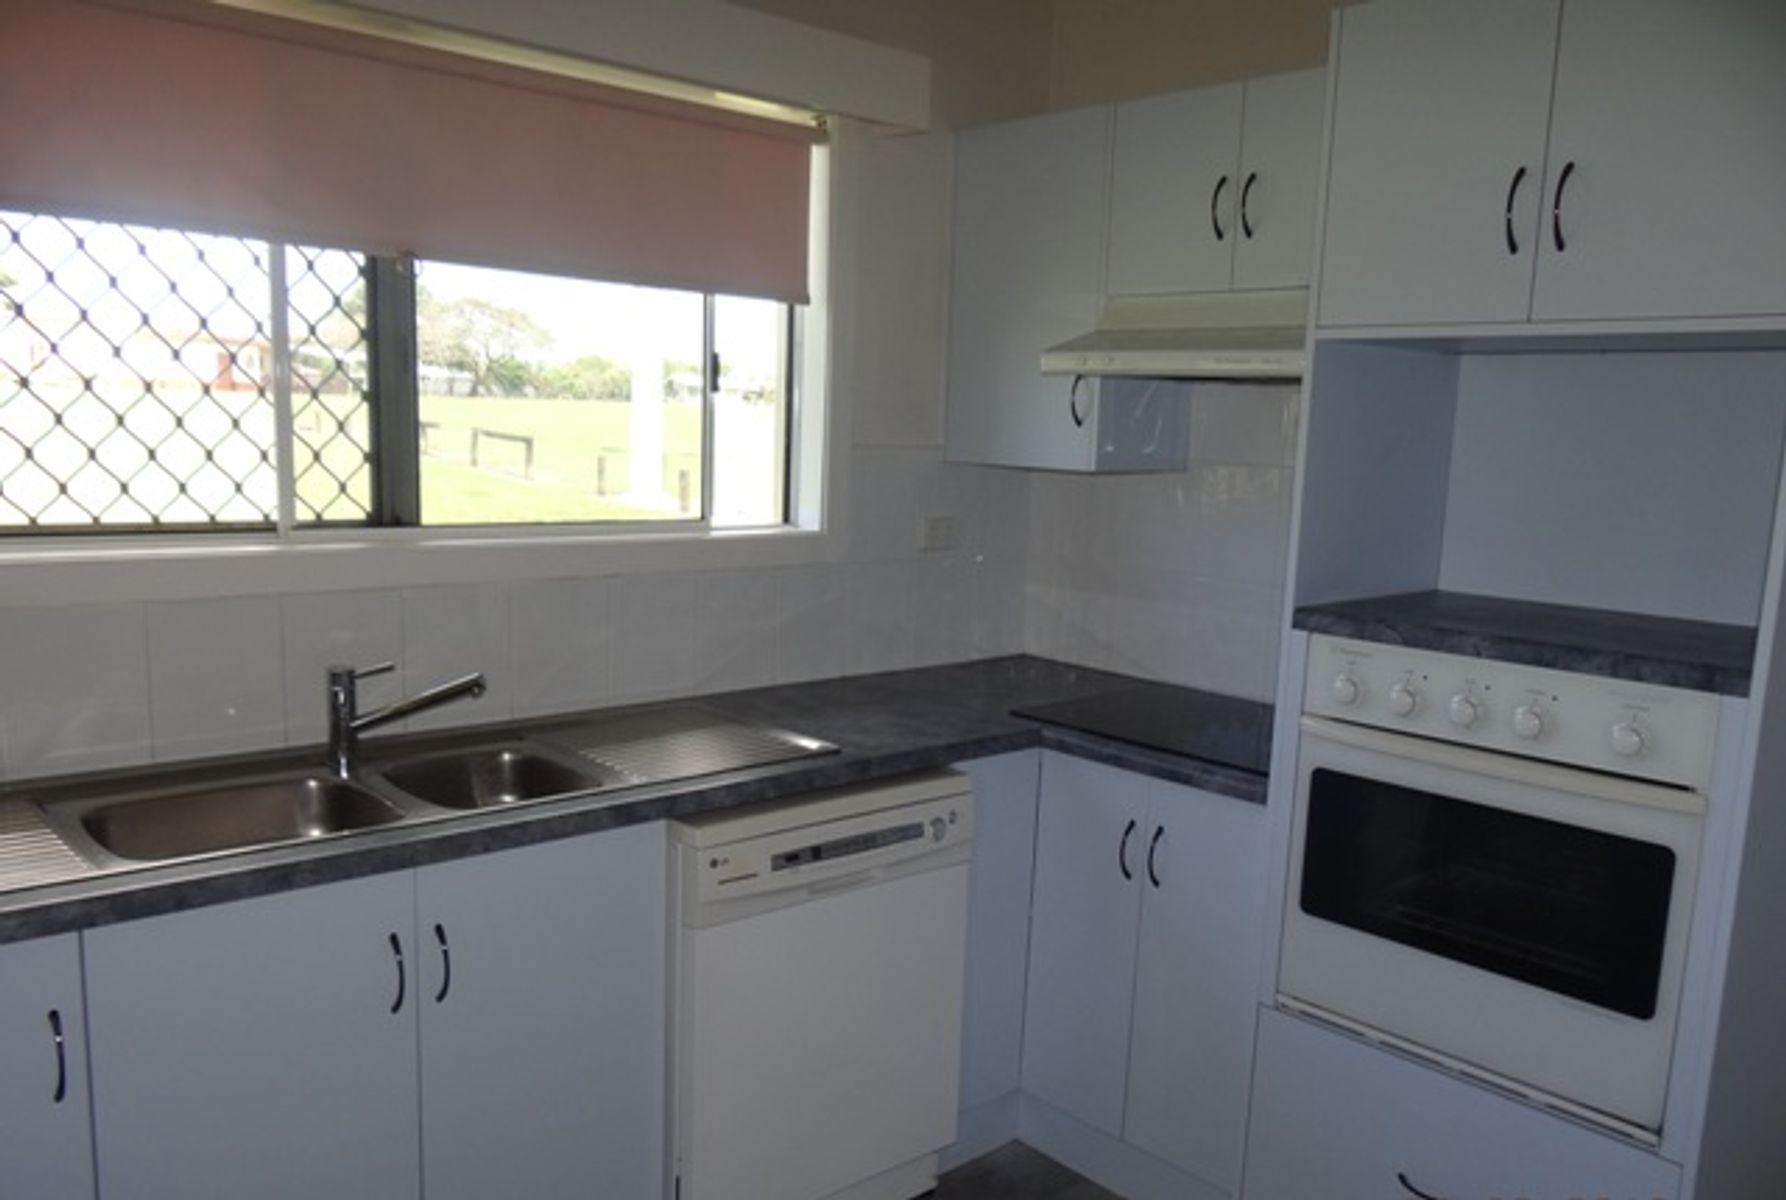 11 Graham Close, Wangan, QLD 4871